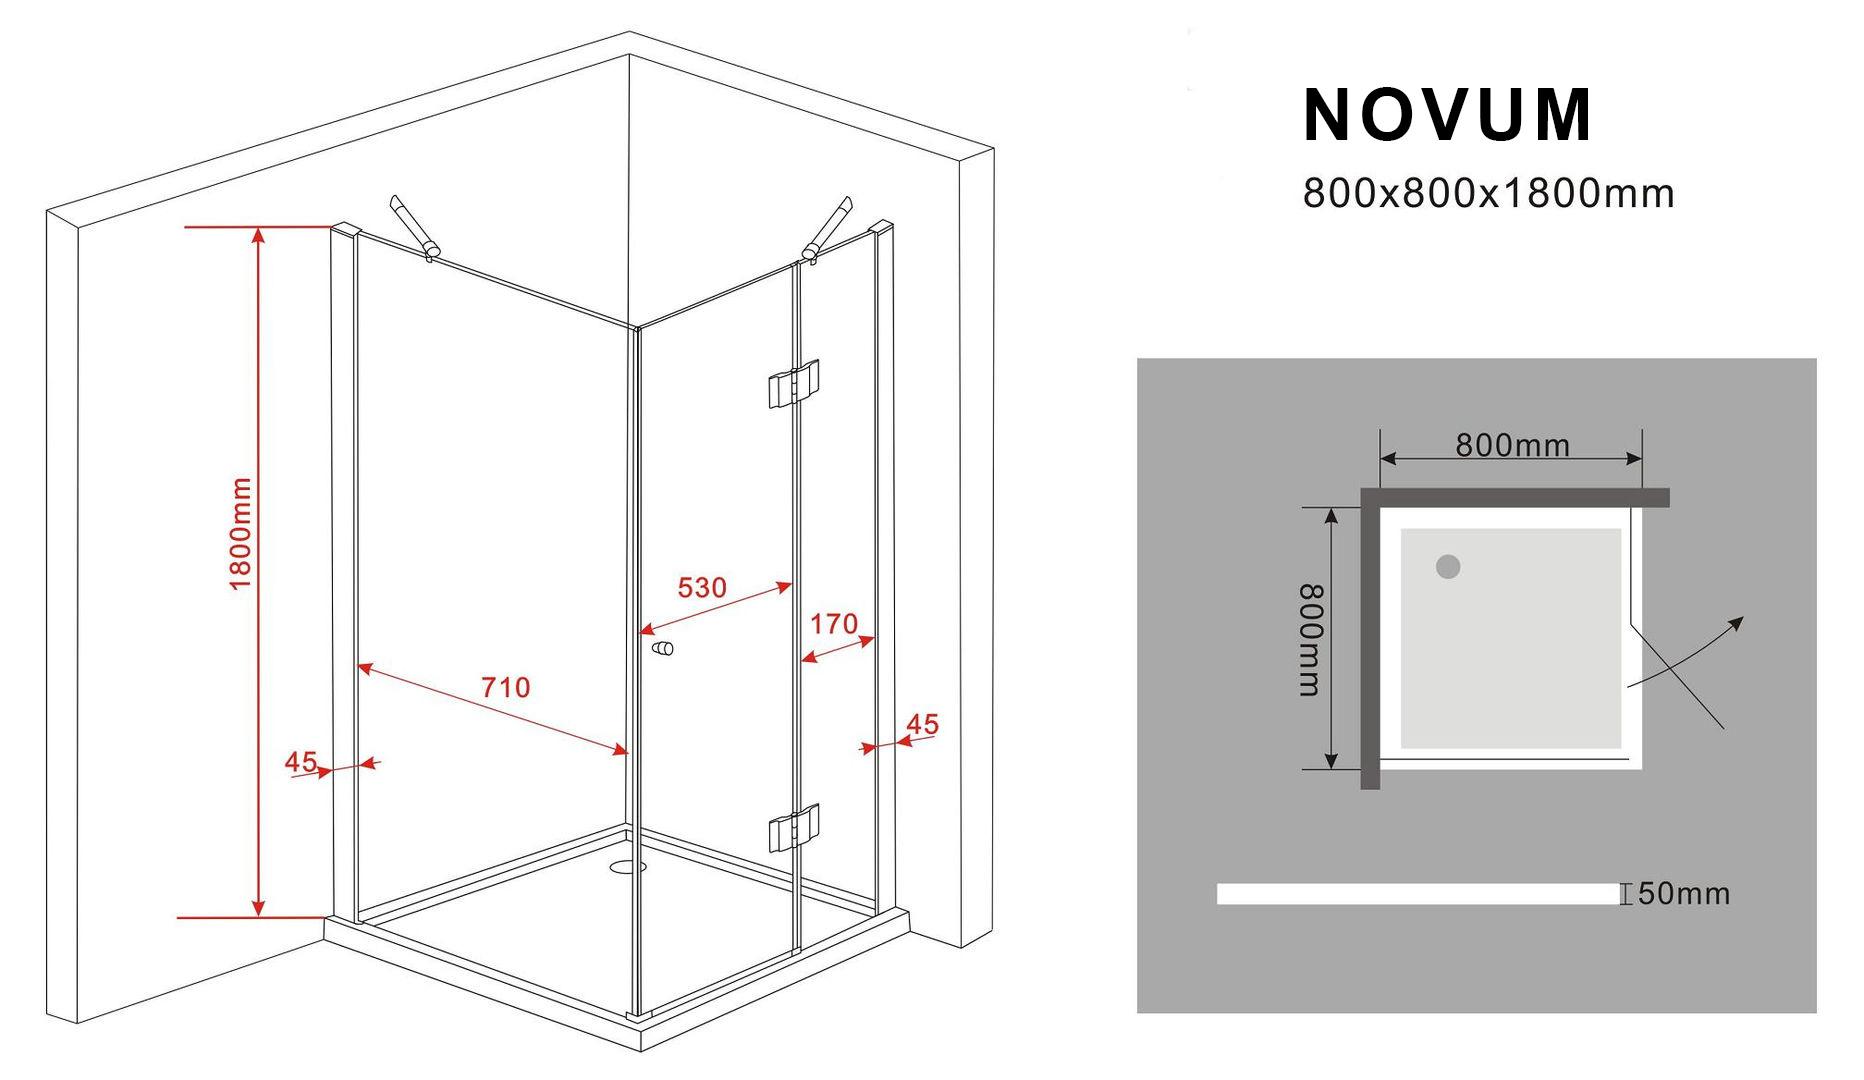 duschkabine novum 80 x 80 x 180 cm ohne duschtasse. Black Bedroom Furniture Sets. Home Design Ideas